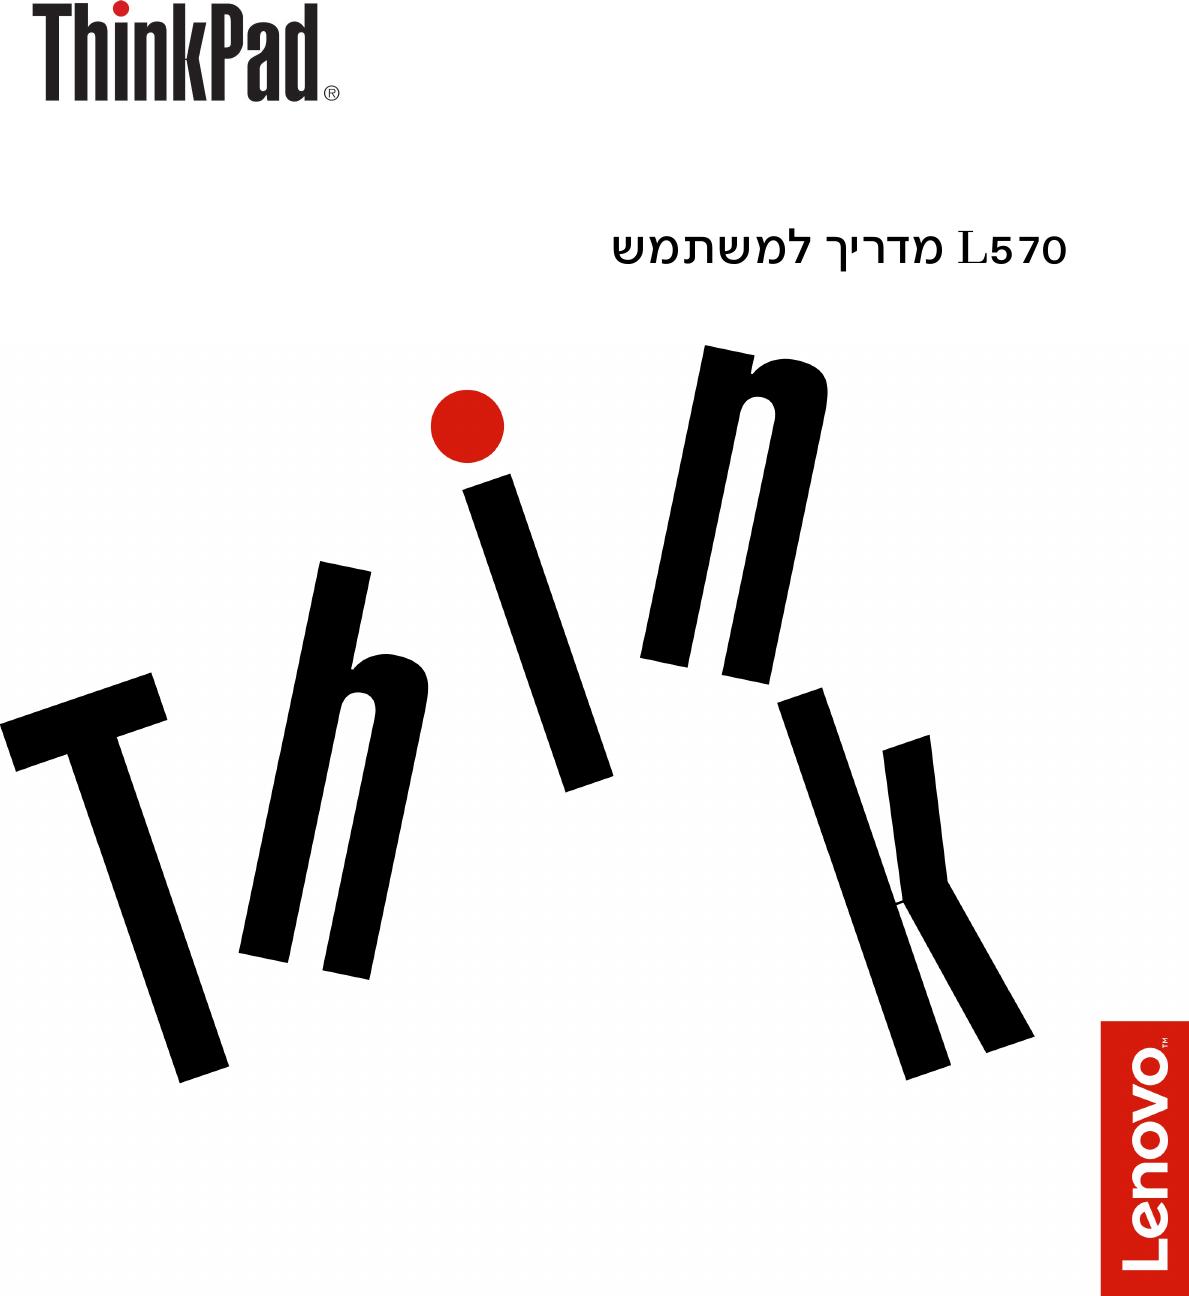 Lenovo L570 Ug He User Manual (Hebrew) Guide Think Pad